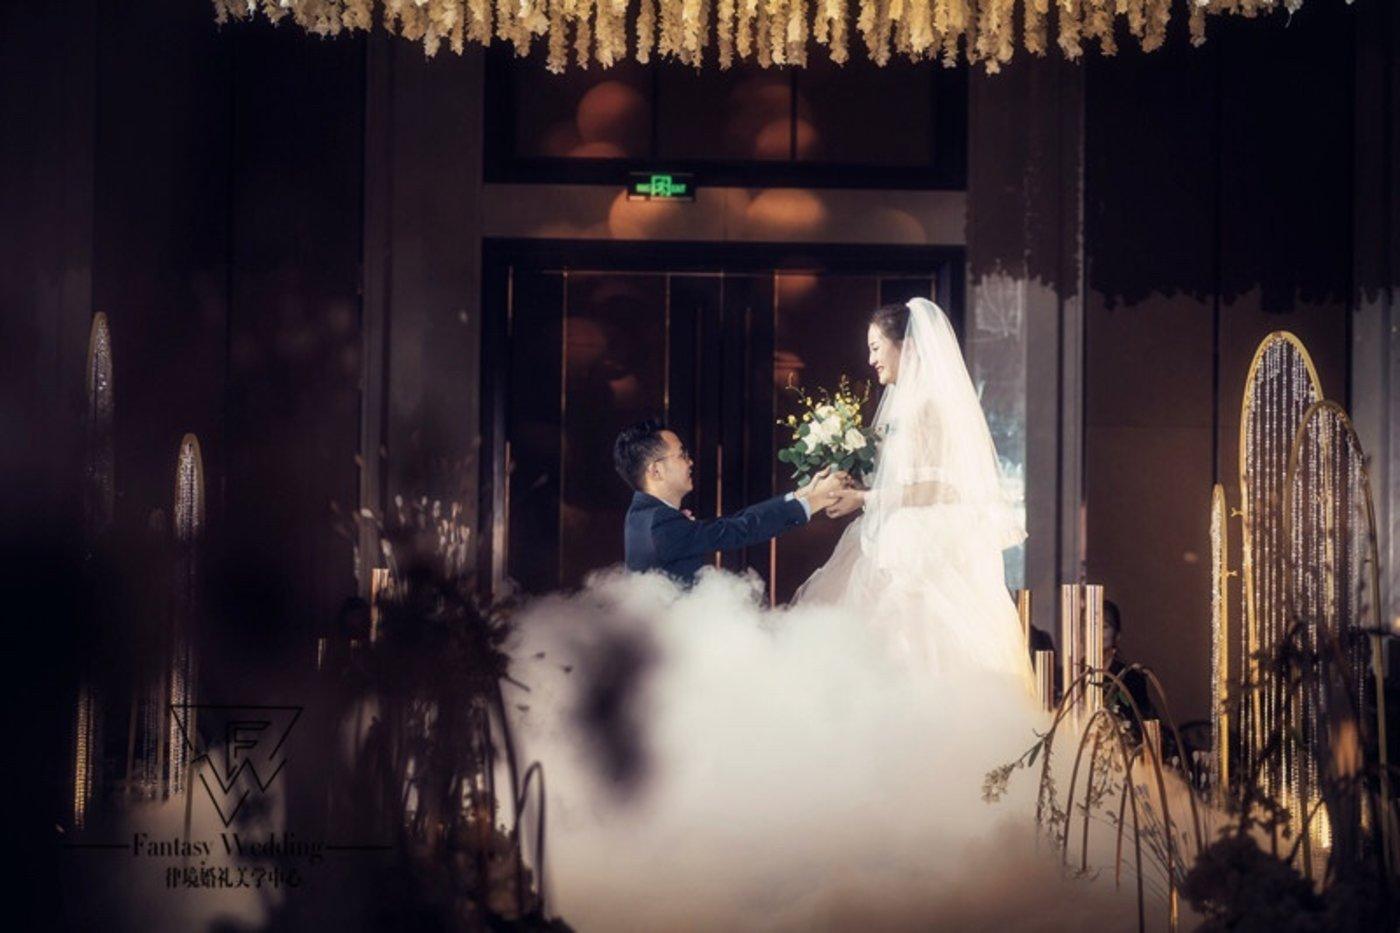 「Fantasy Wedding」丰大国际5